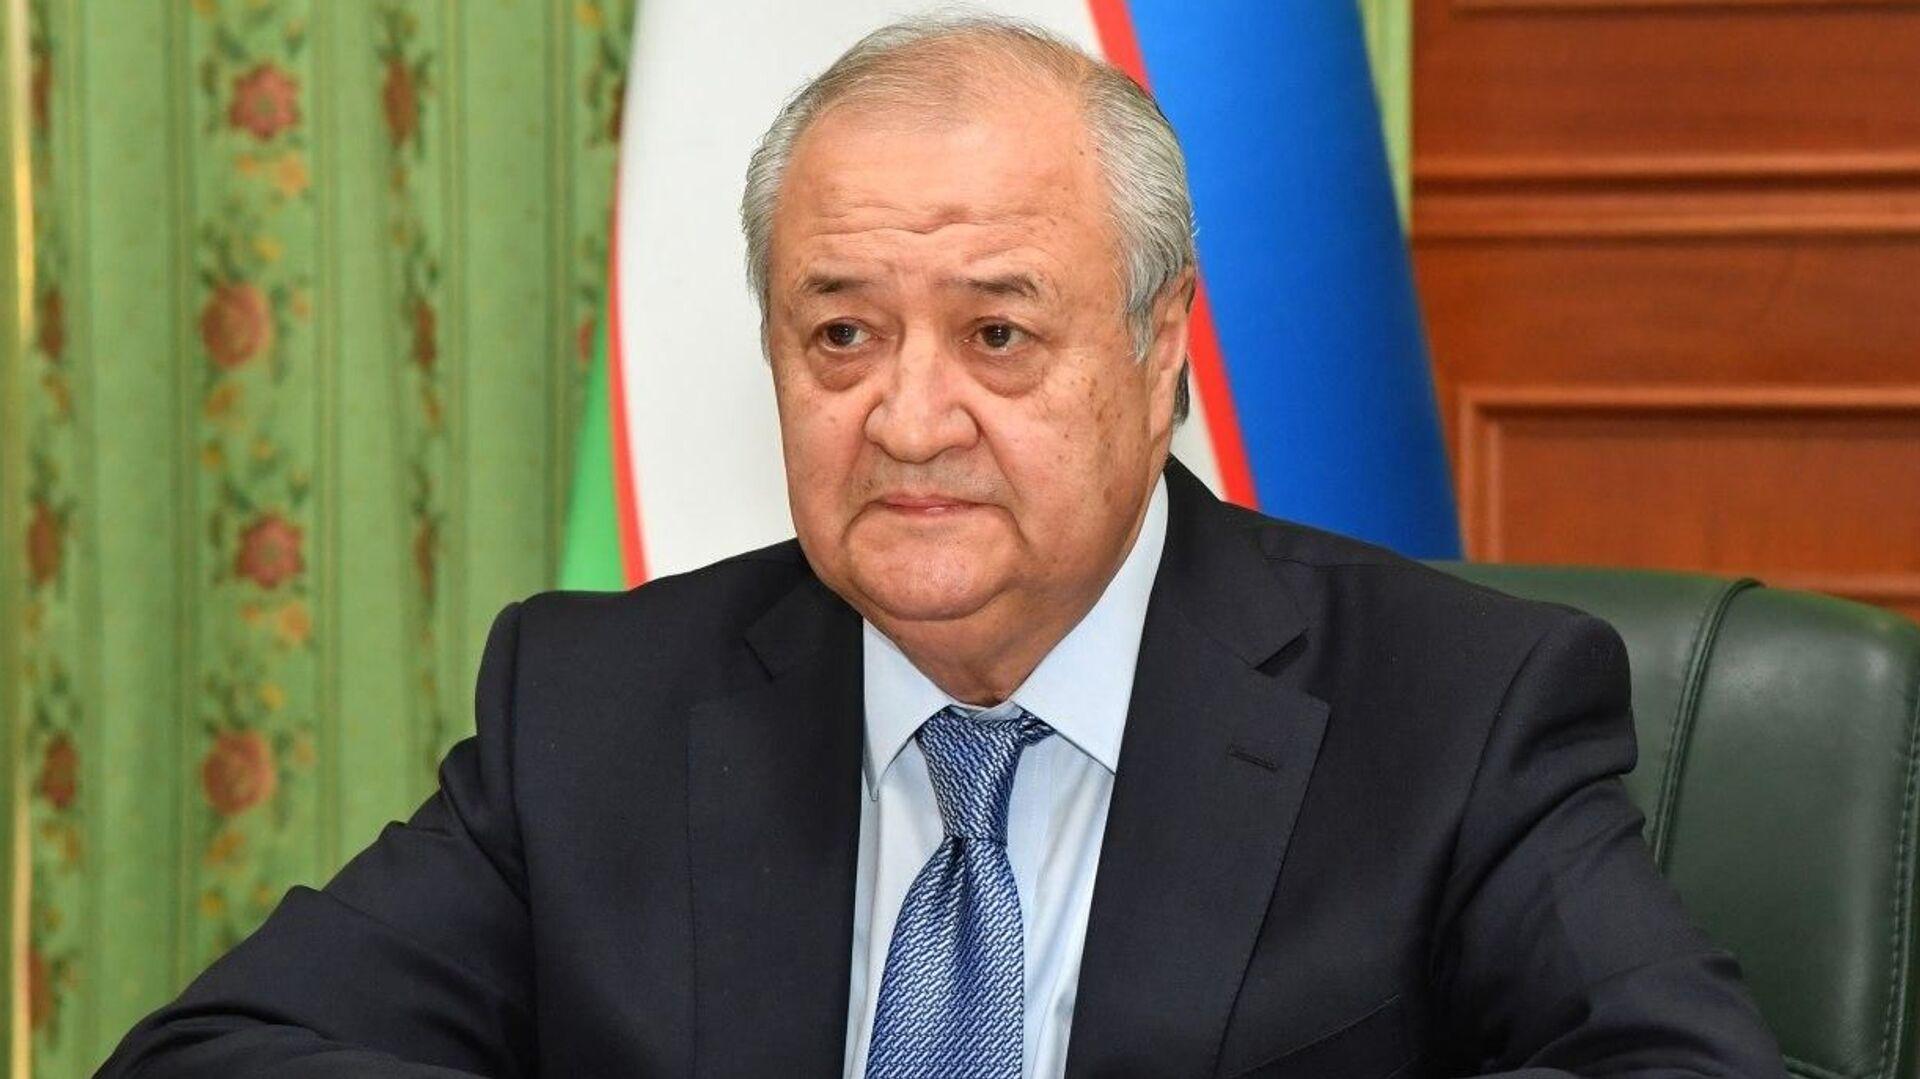 Министр иностранных дел Узбекистана Абдулазиз Камилов  - Sputnik Узбекистан, 1920, 29.06.2021